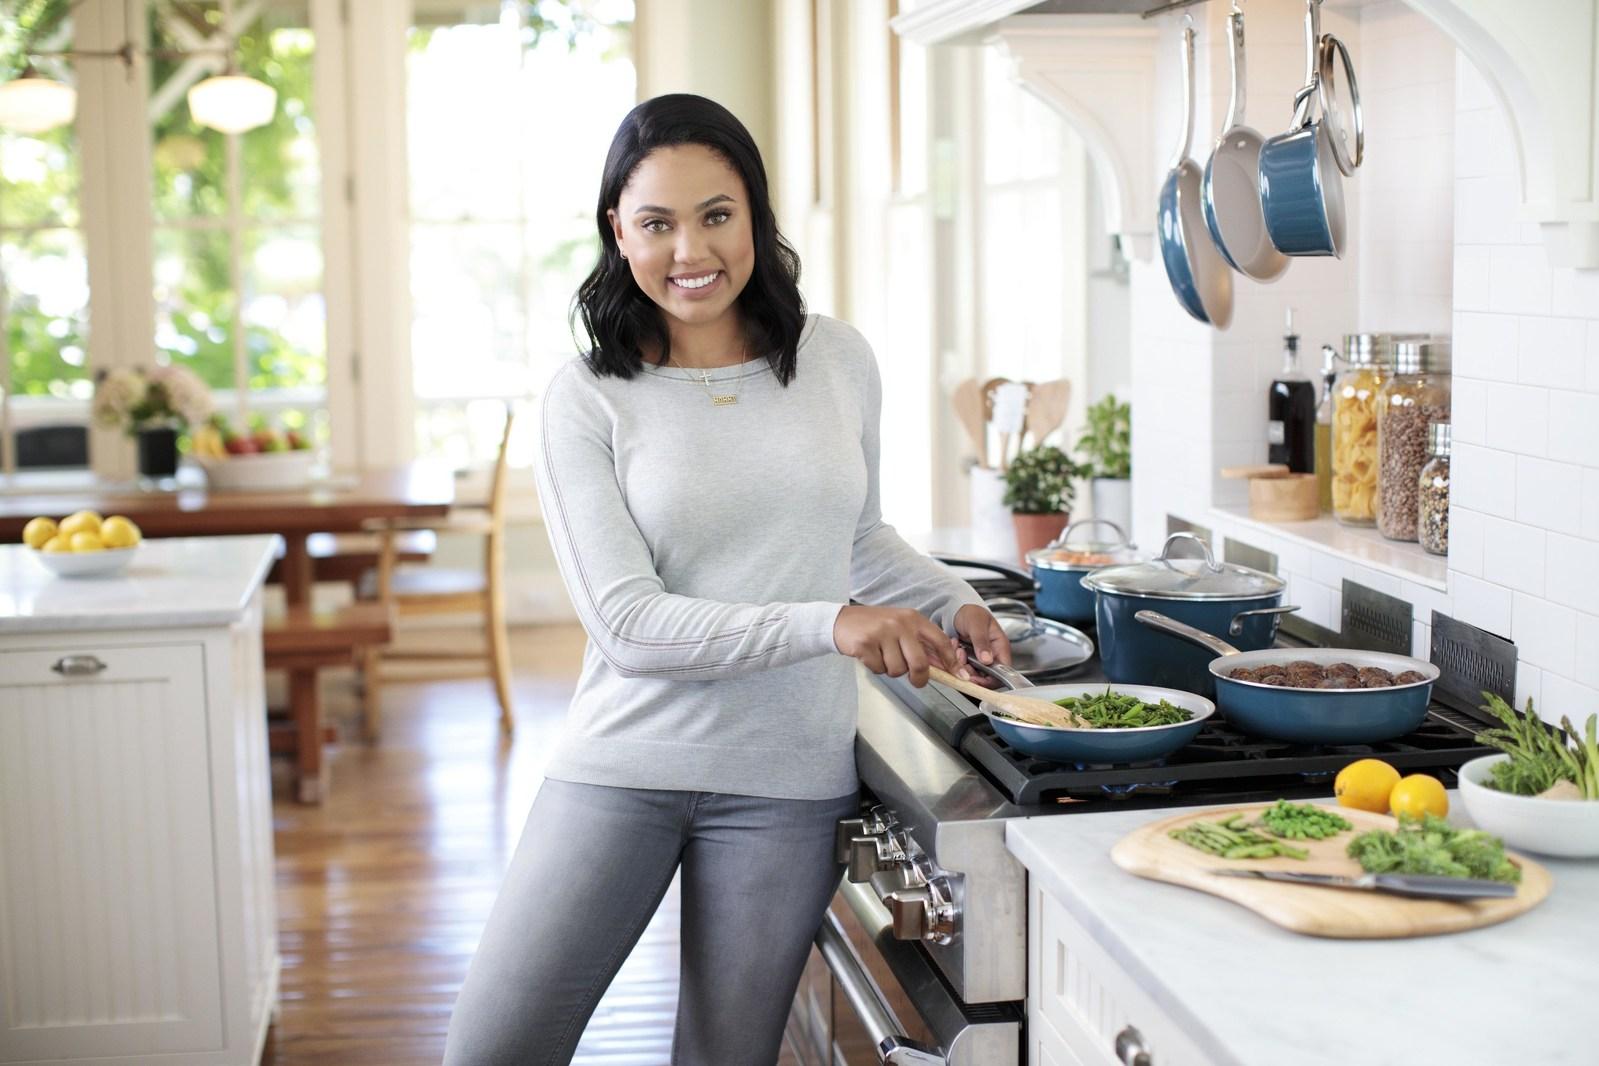 Ayesha Curry Gets Kitchenware Brand